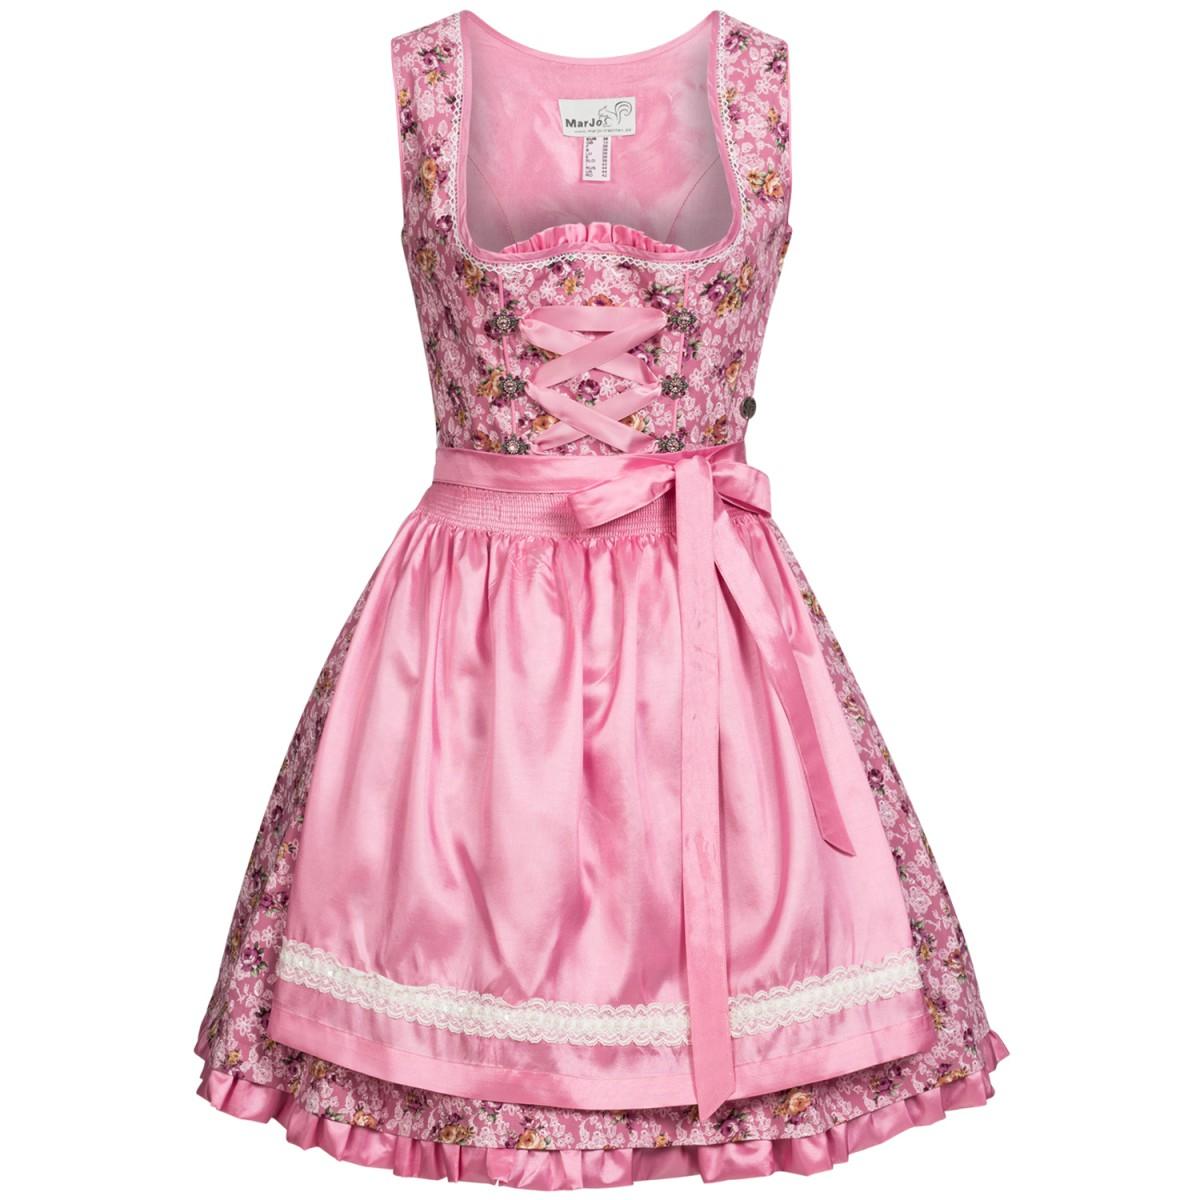 mini dirndl agnes in rosa von marjo trachten damen dirndl. Black Bedroom Furniture Sets. Home Design Ideas